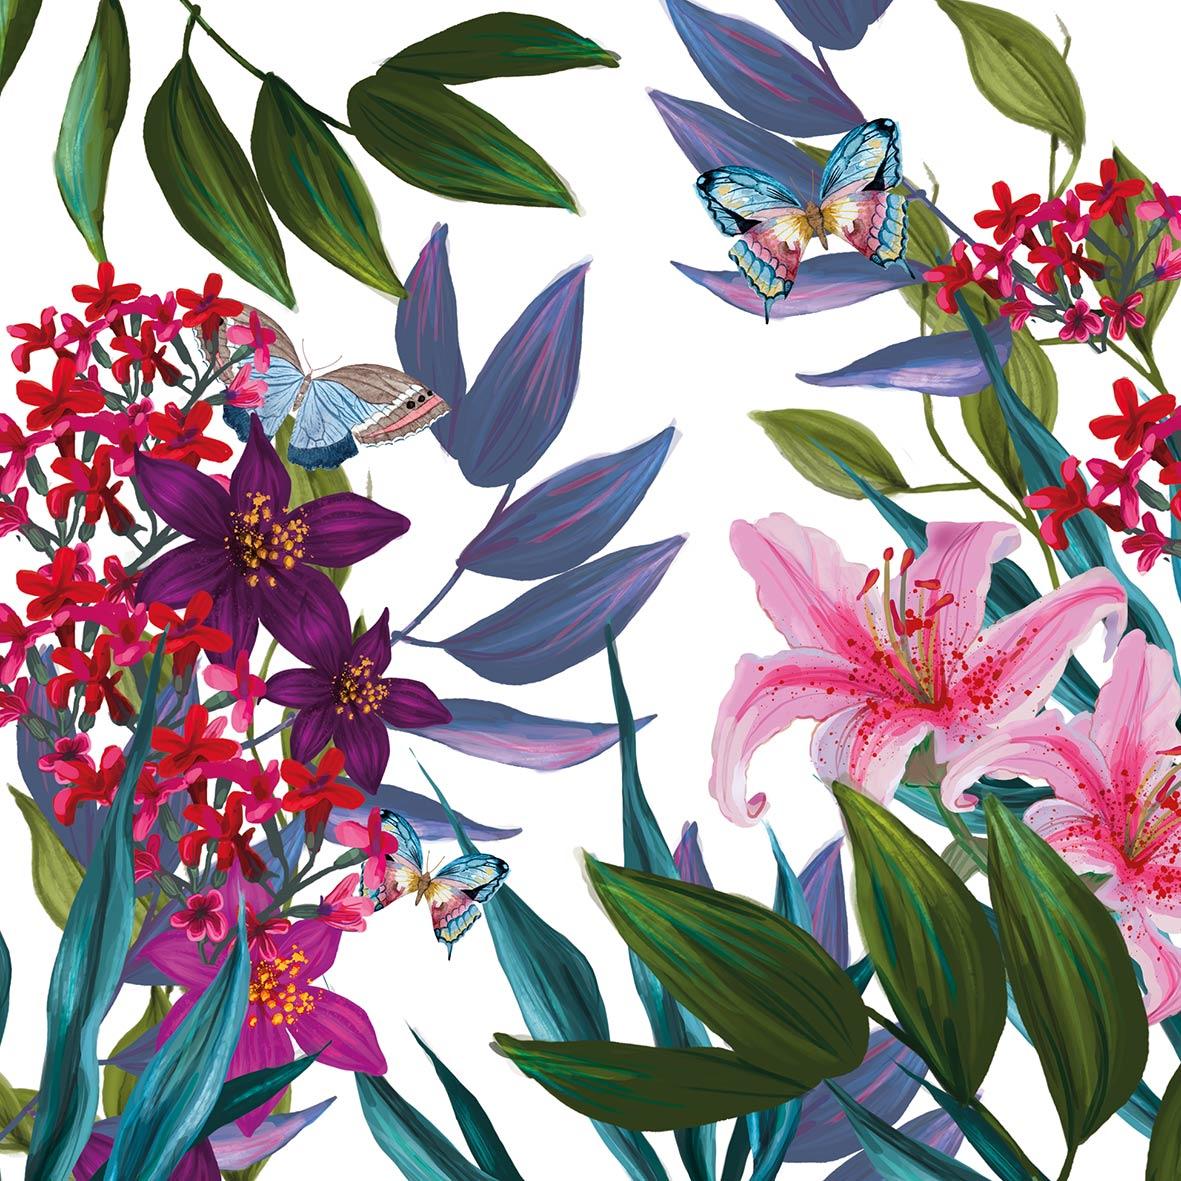 Tropical Lilies 33x33 cm